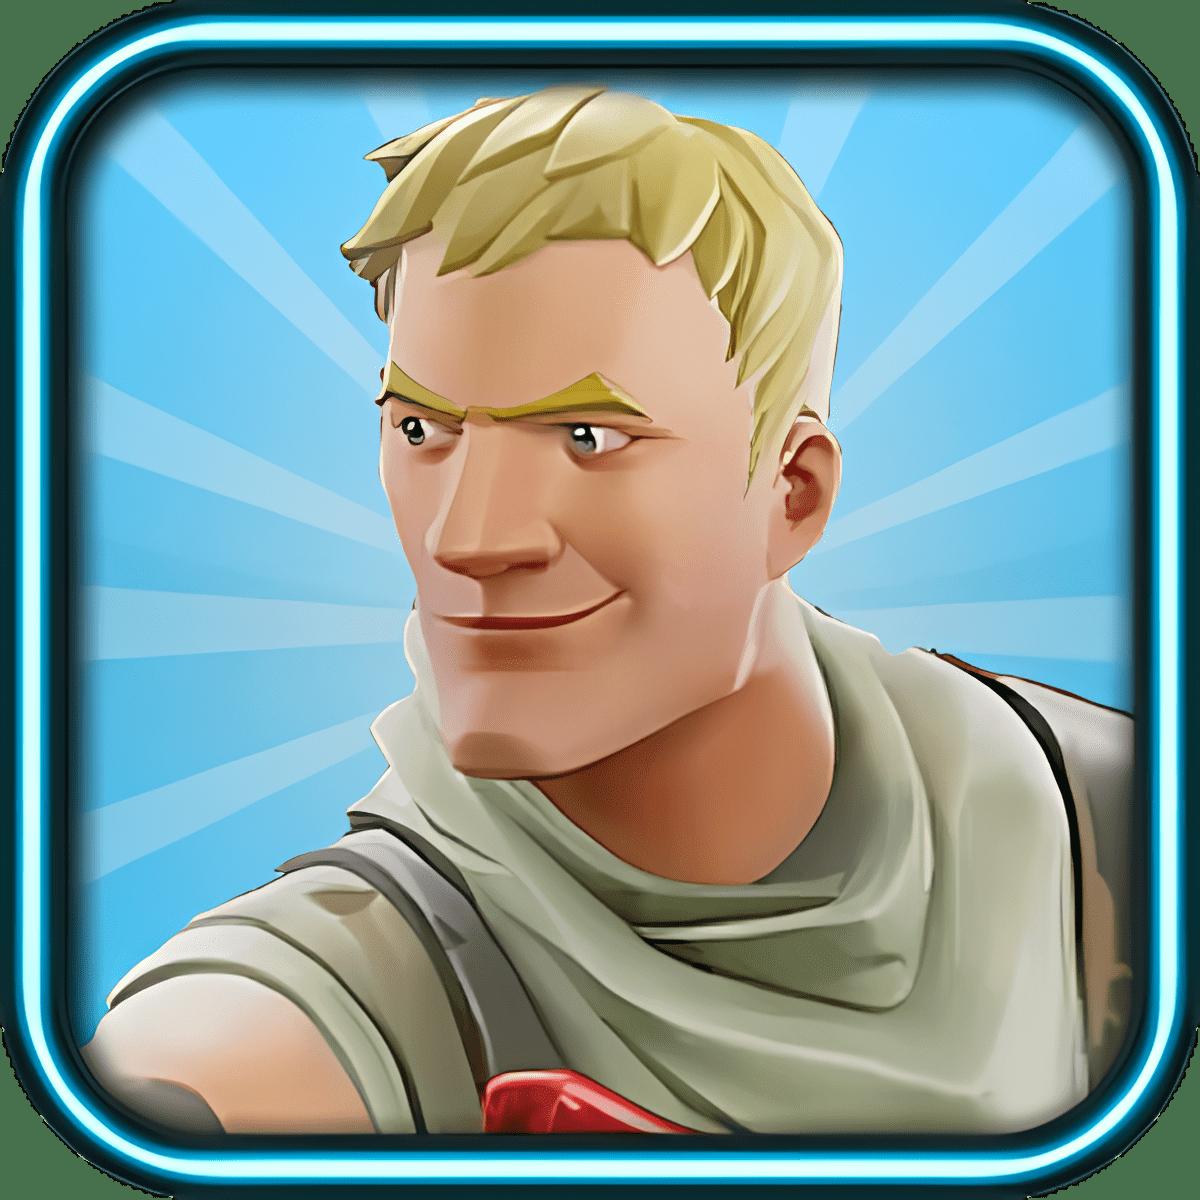 Fortnite Mobile Game Wallpaper